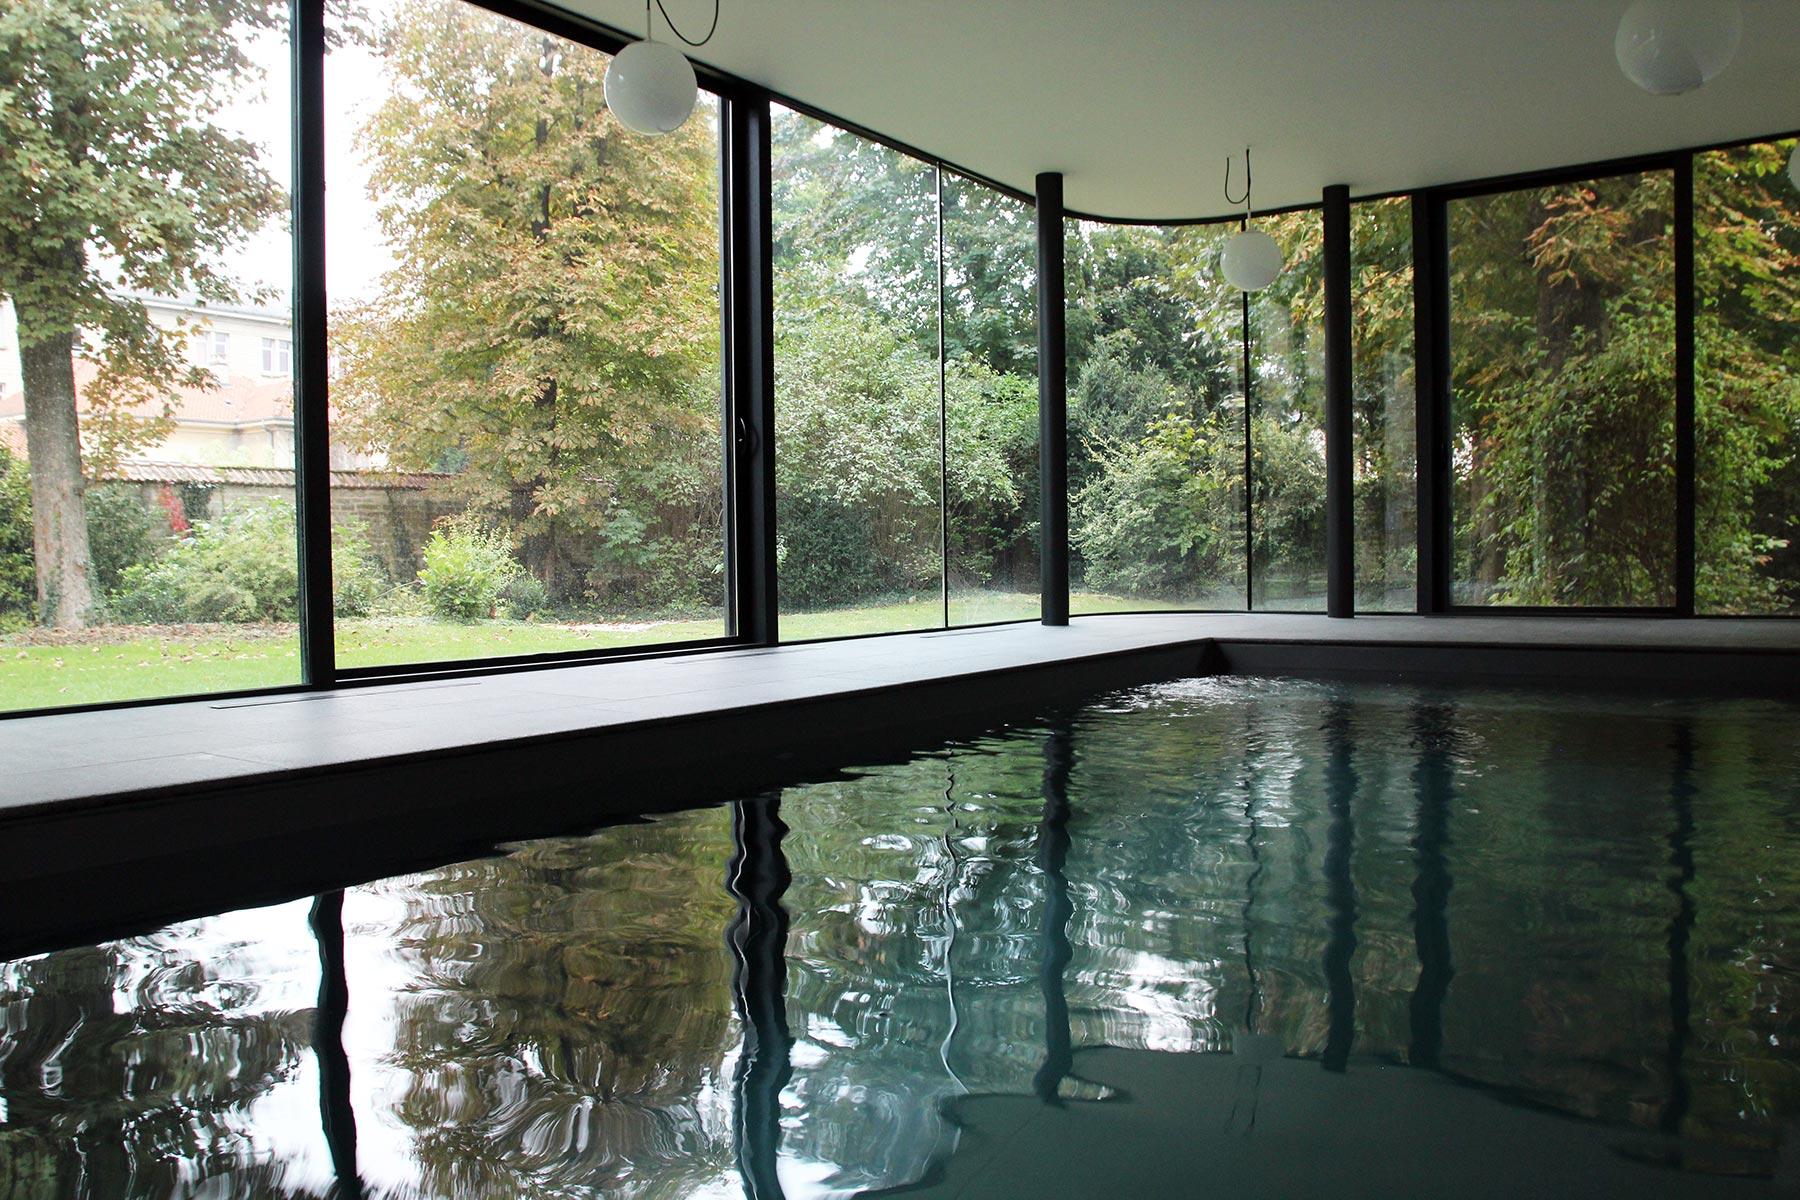 colomes-nomdedeu-extension-piscine-3